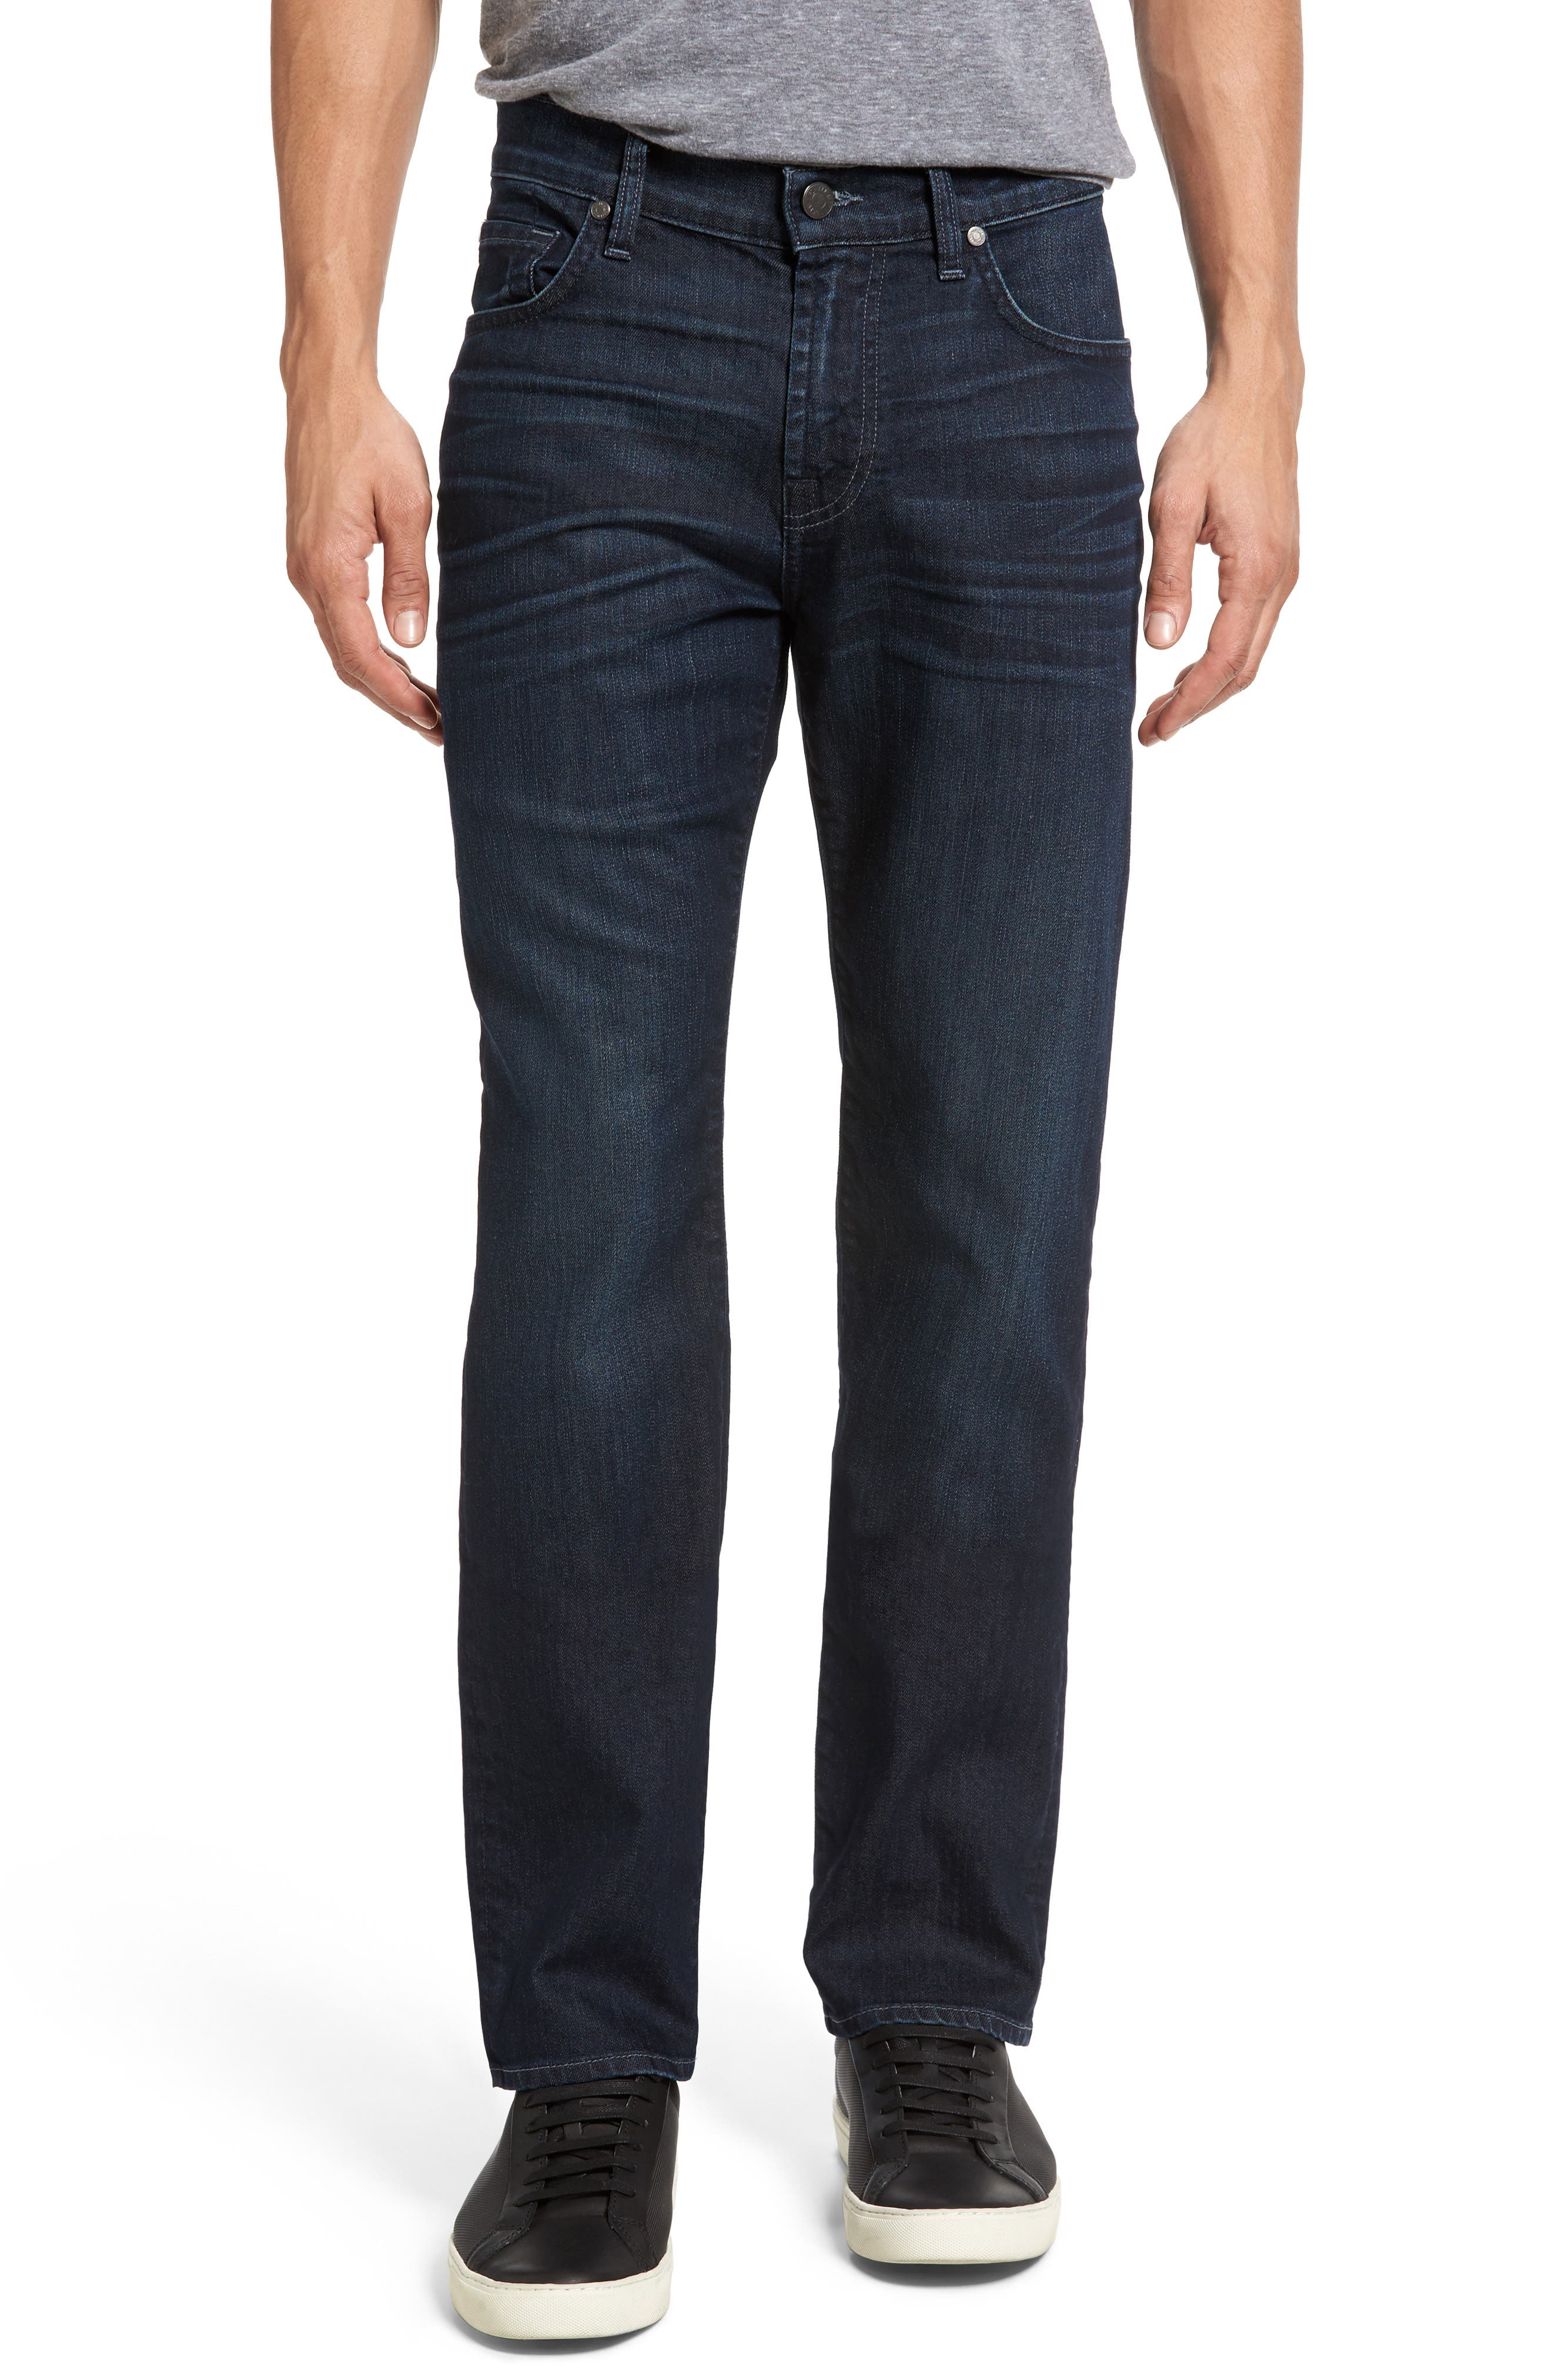 Men's 7 For All Mankind The Straight Airweft Slim Straight Slim Leg Jeans